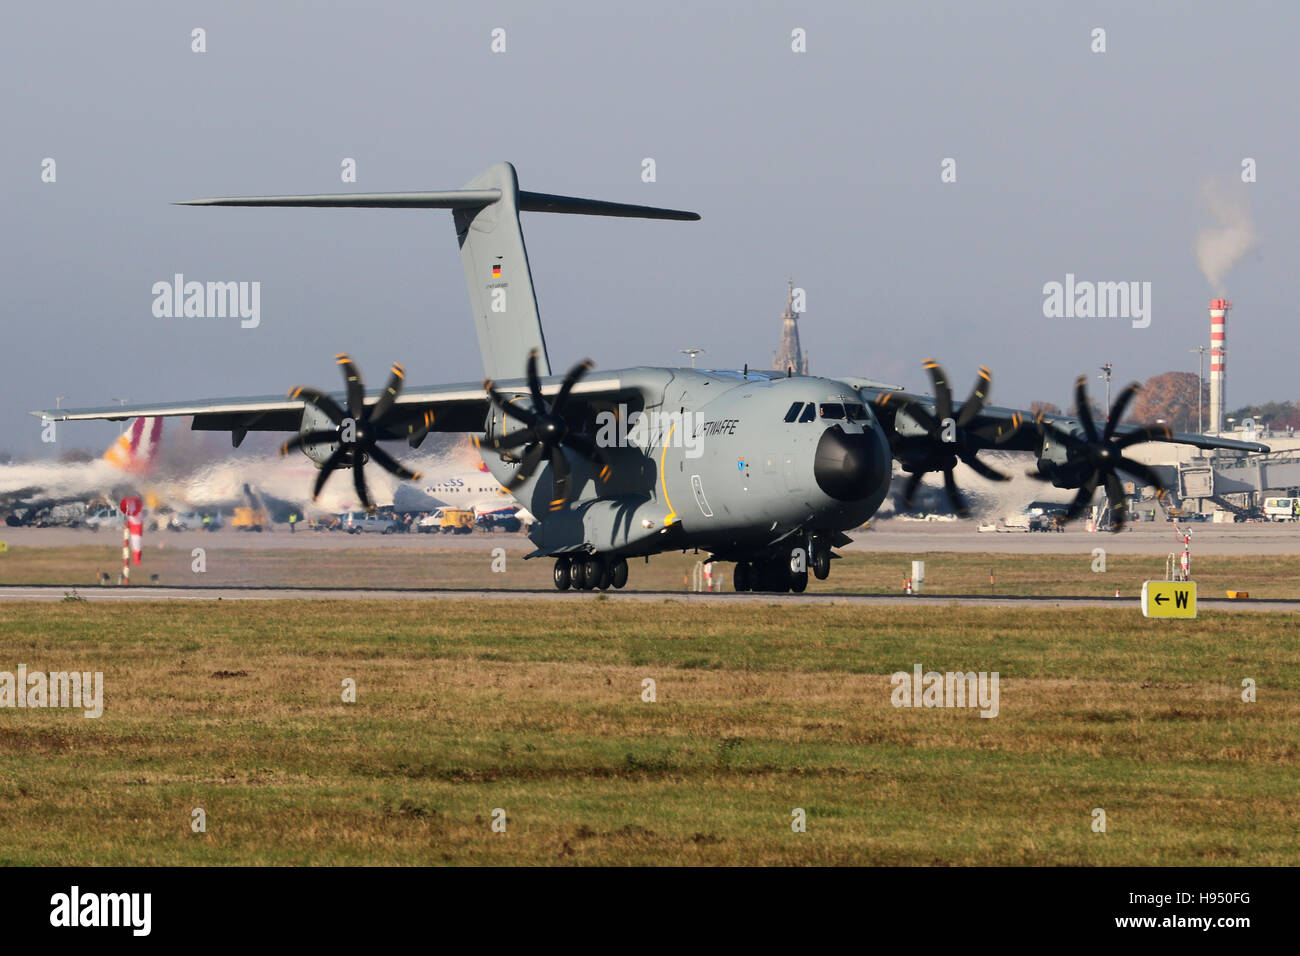 Stuttgart, Germany – October 31, 2016: Bundeswehr Luftwaffe, Airbus A400M is landing at Stuttgart Airport - Stock Image